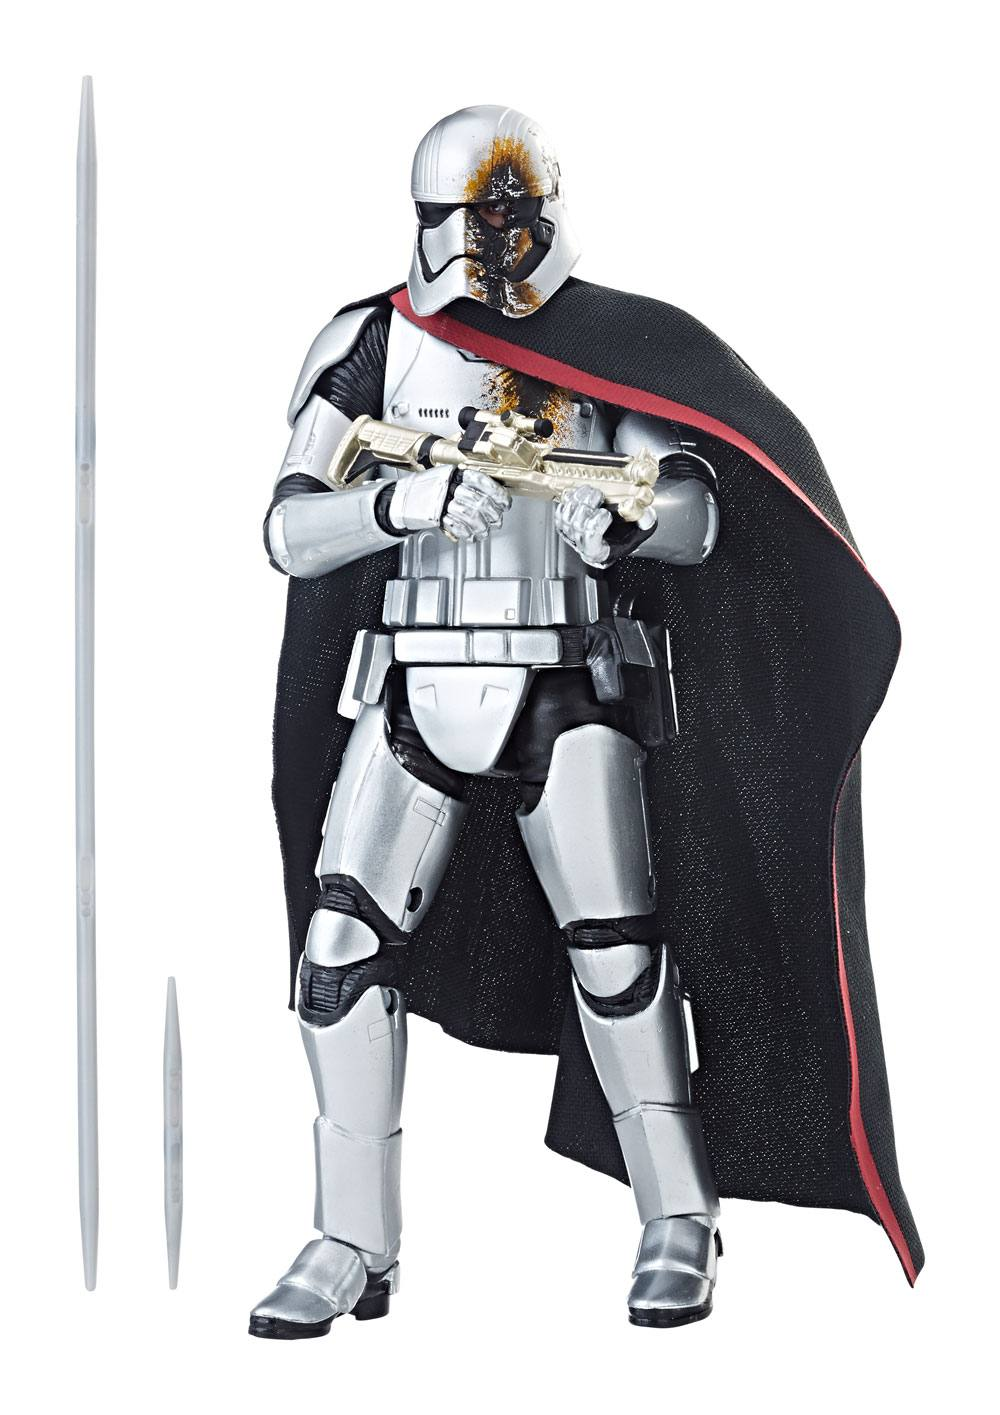 Star Wars Episode VIII Black Series Action Figure 2019 Captain Phasma (Quicksilver Baton) 15 cm --- DAMAGED PACKAGING